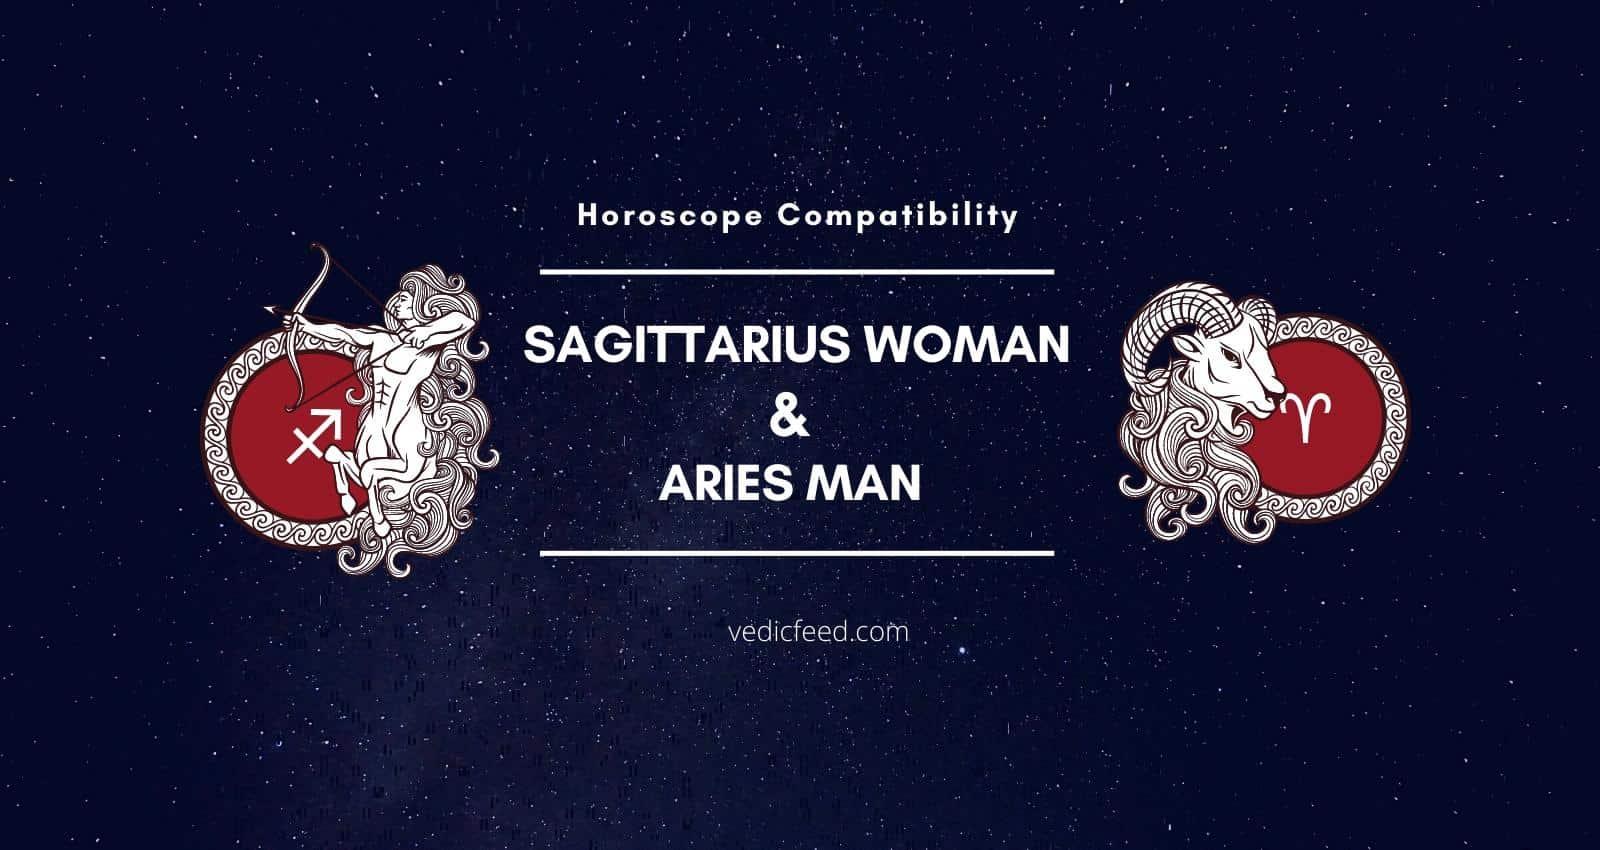 Aries Man and Sagittarius Woman